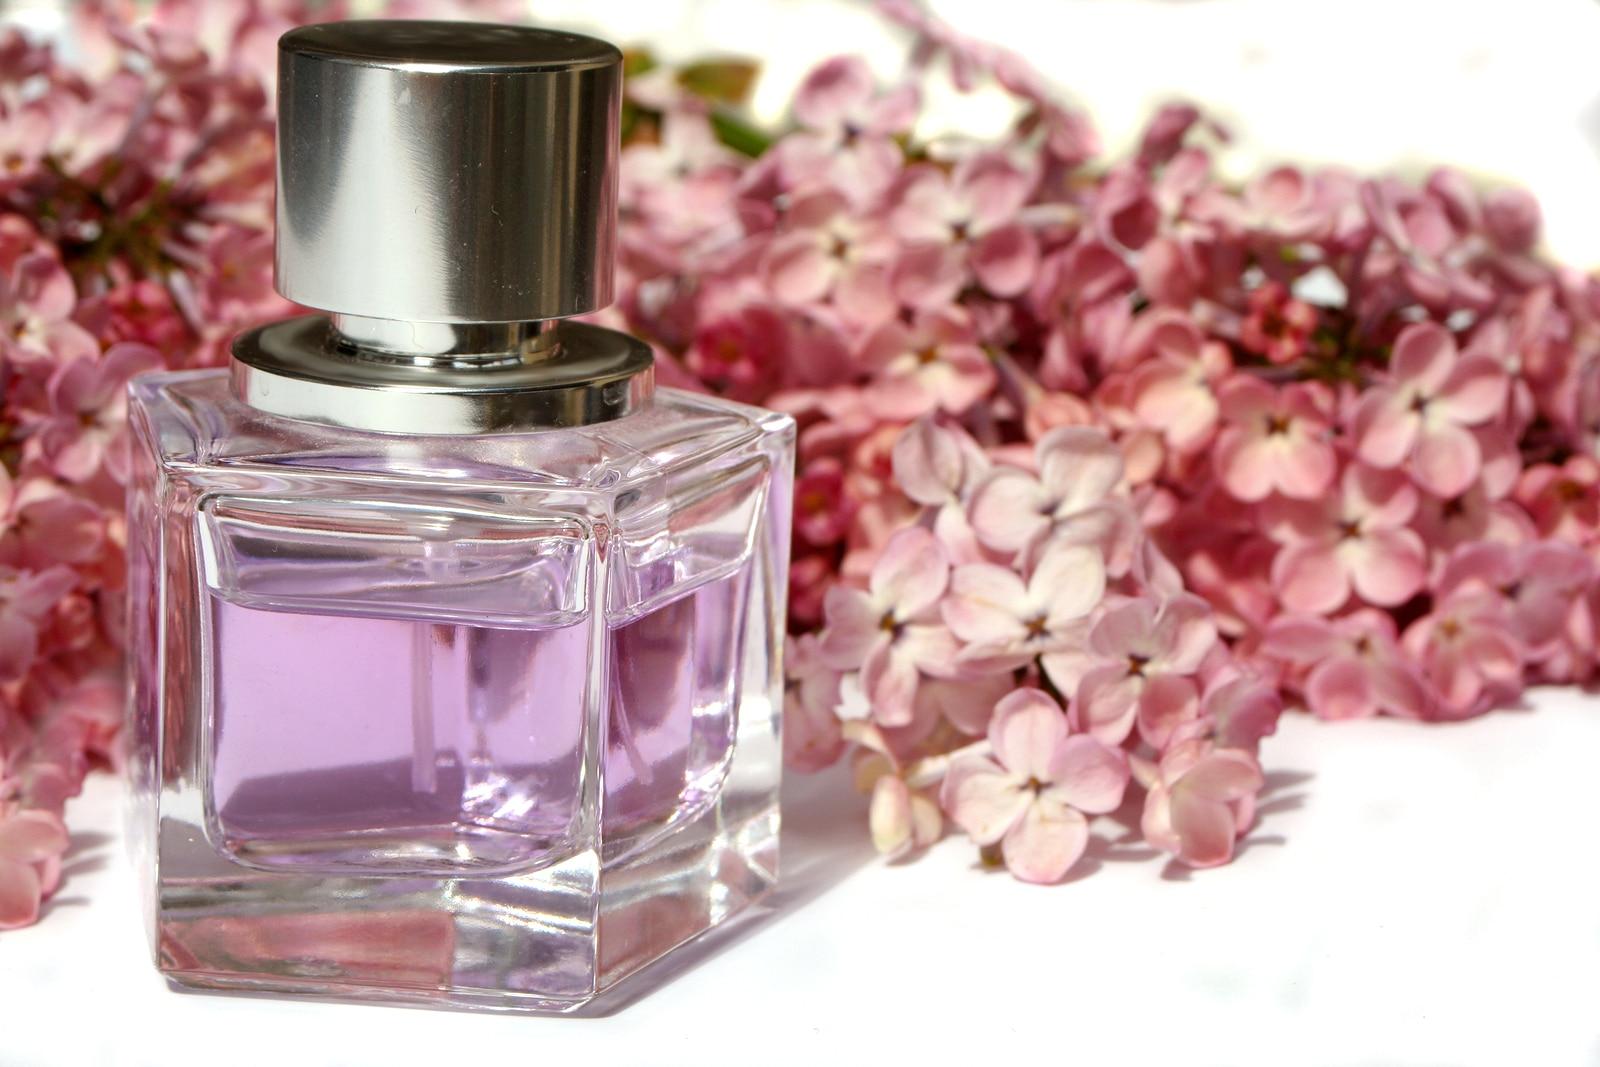 Trucos para que tu perfume se quede contigo todo el dia